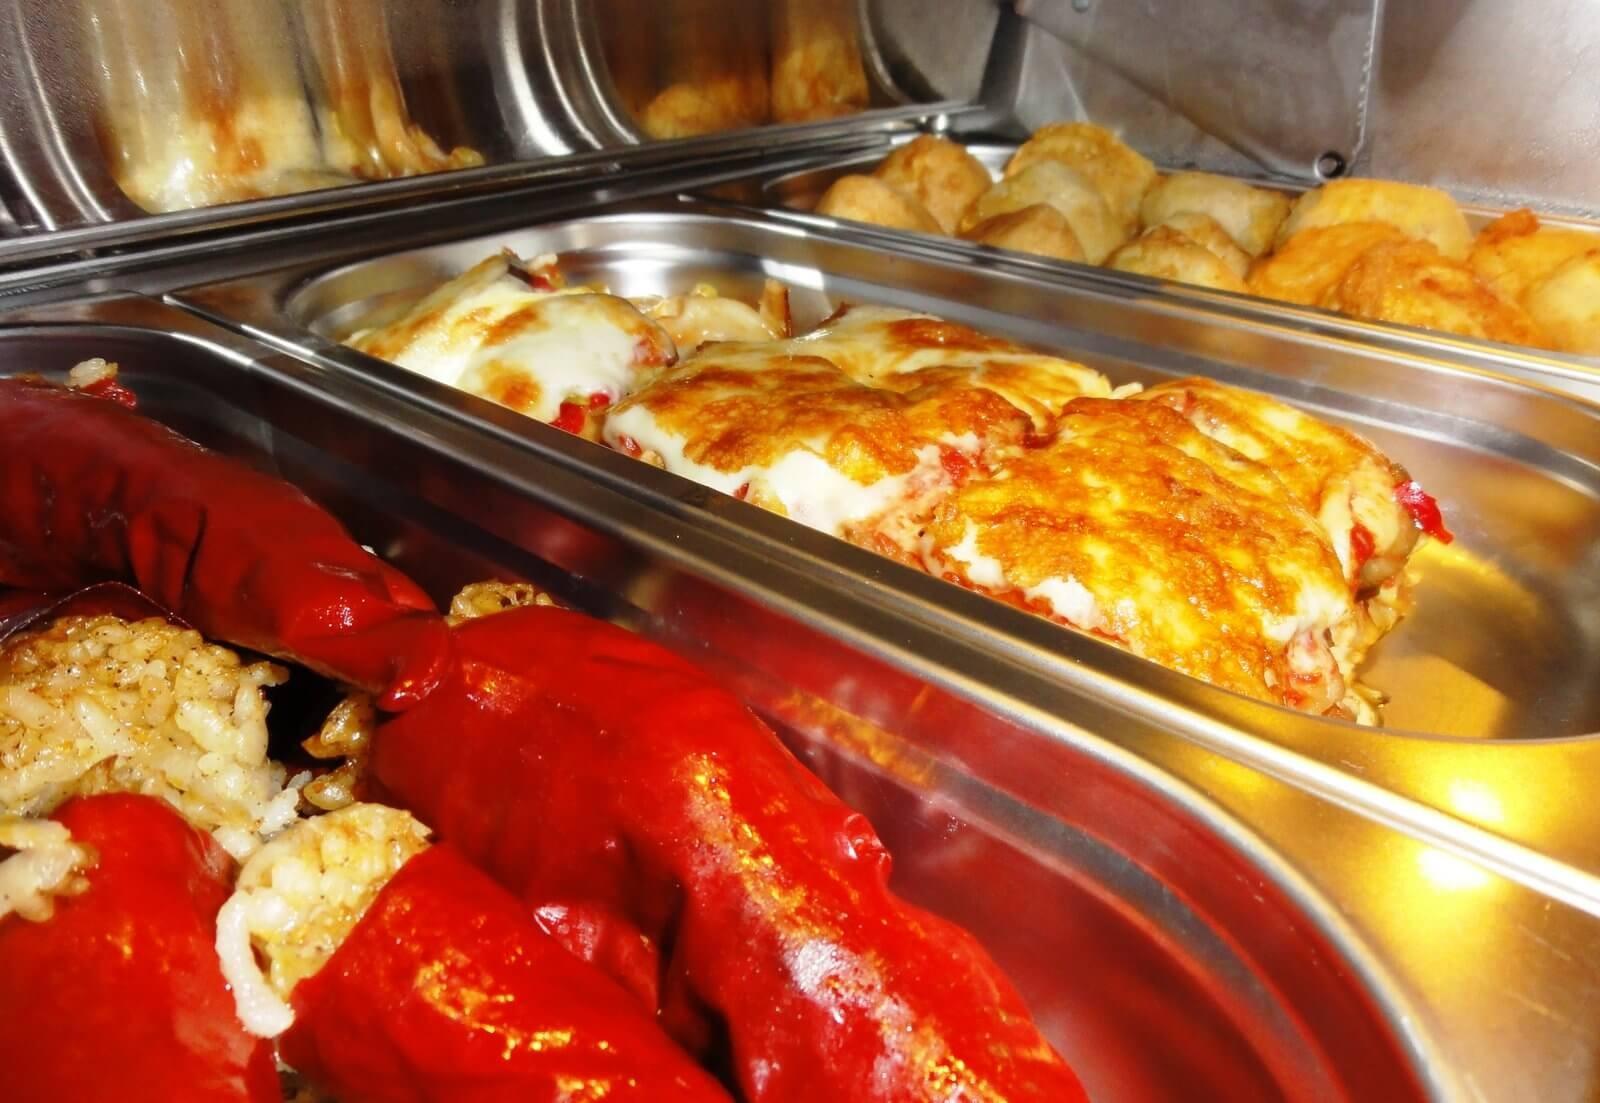 Vegetarian dishes at Sunday brunch